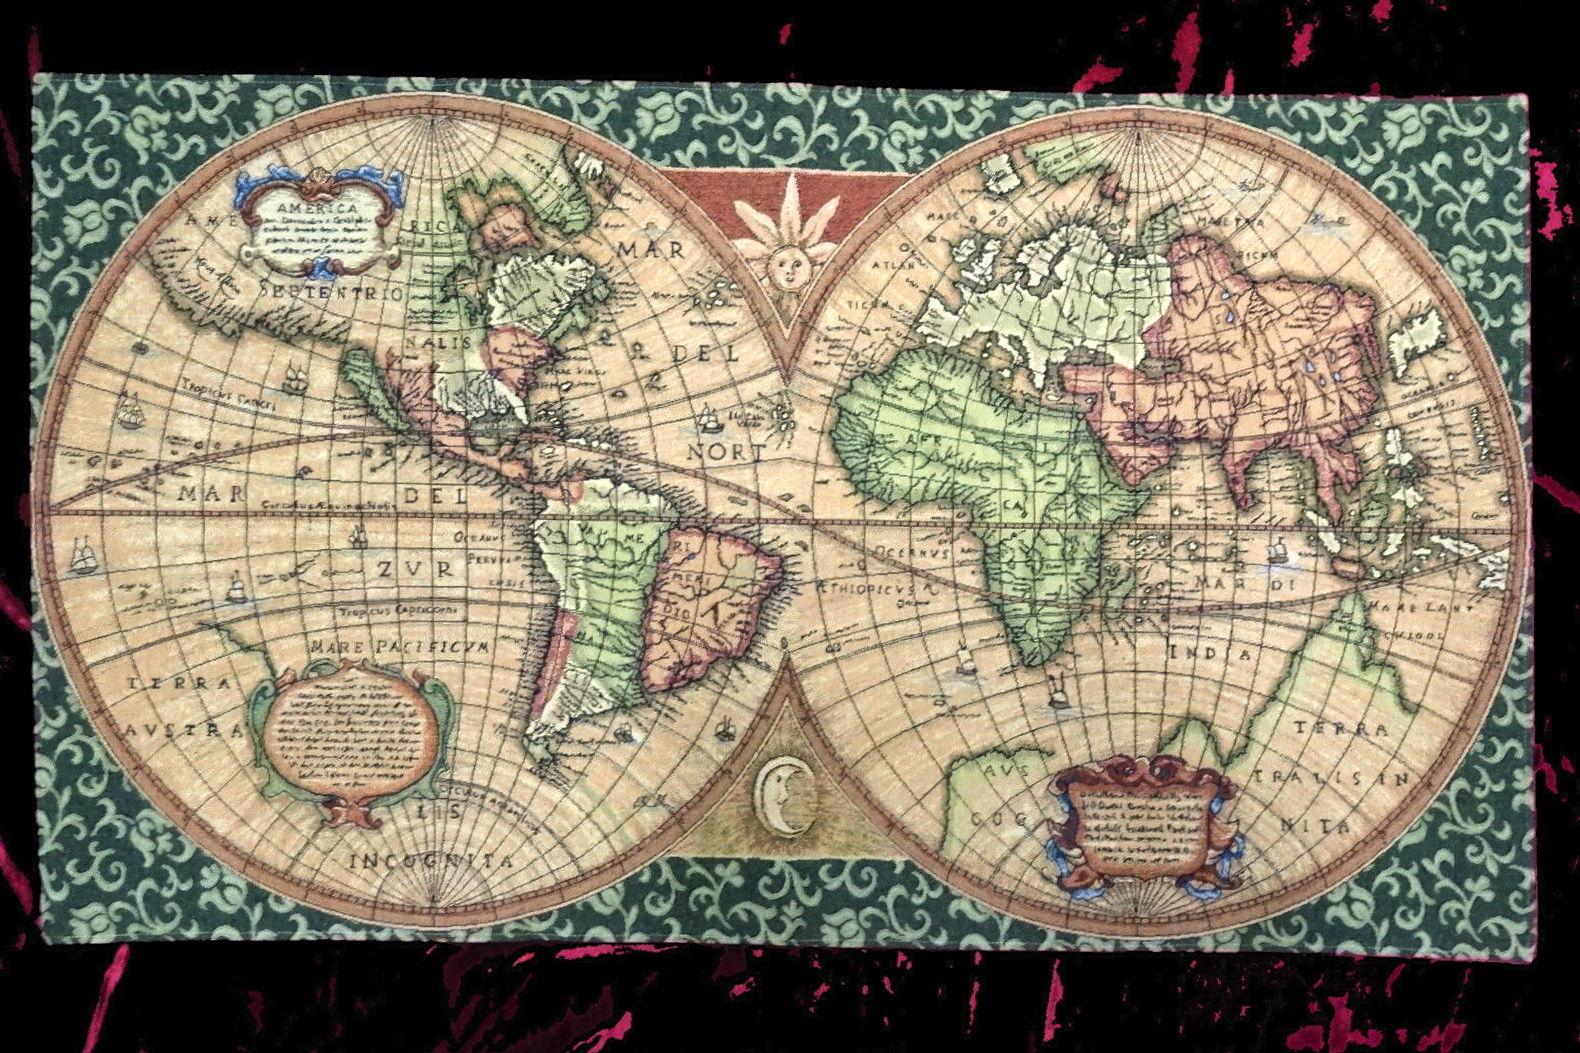 wandteppich gobelin old map landkarte weltkarte antik 117 x 69 wanddeko kaufen bei pintici. Black Bedroom Furniture Sets. Home Design Ideas